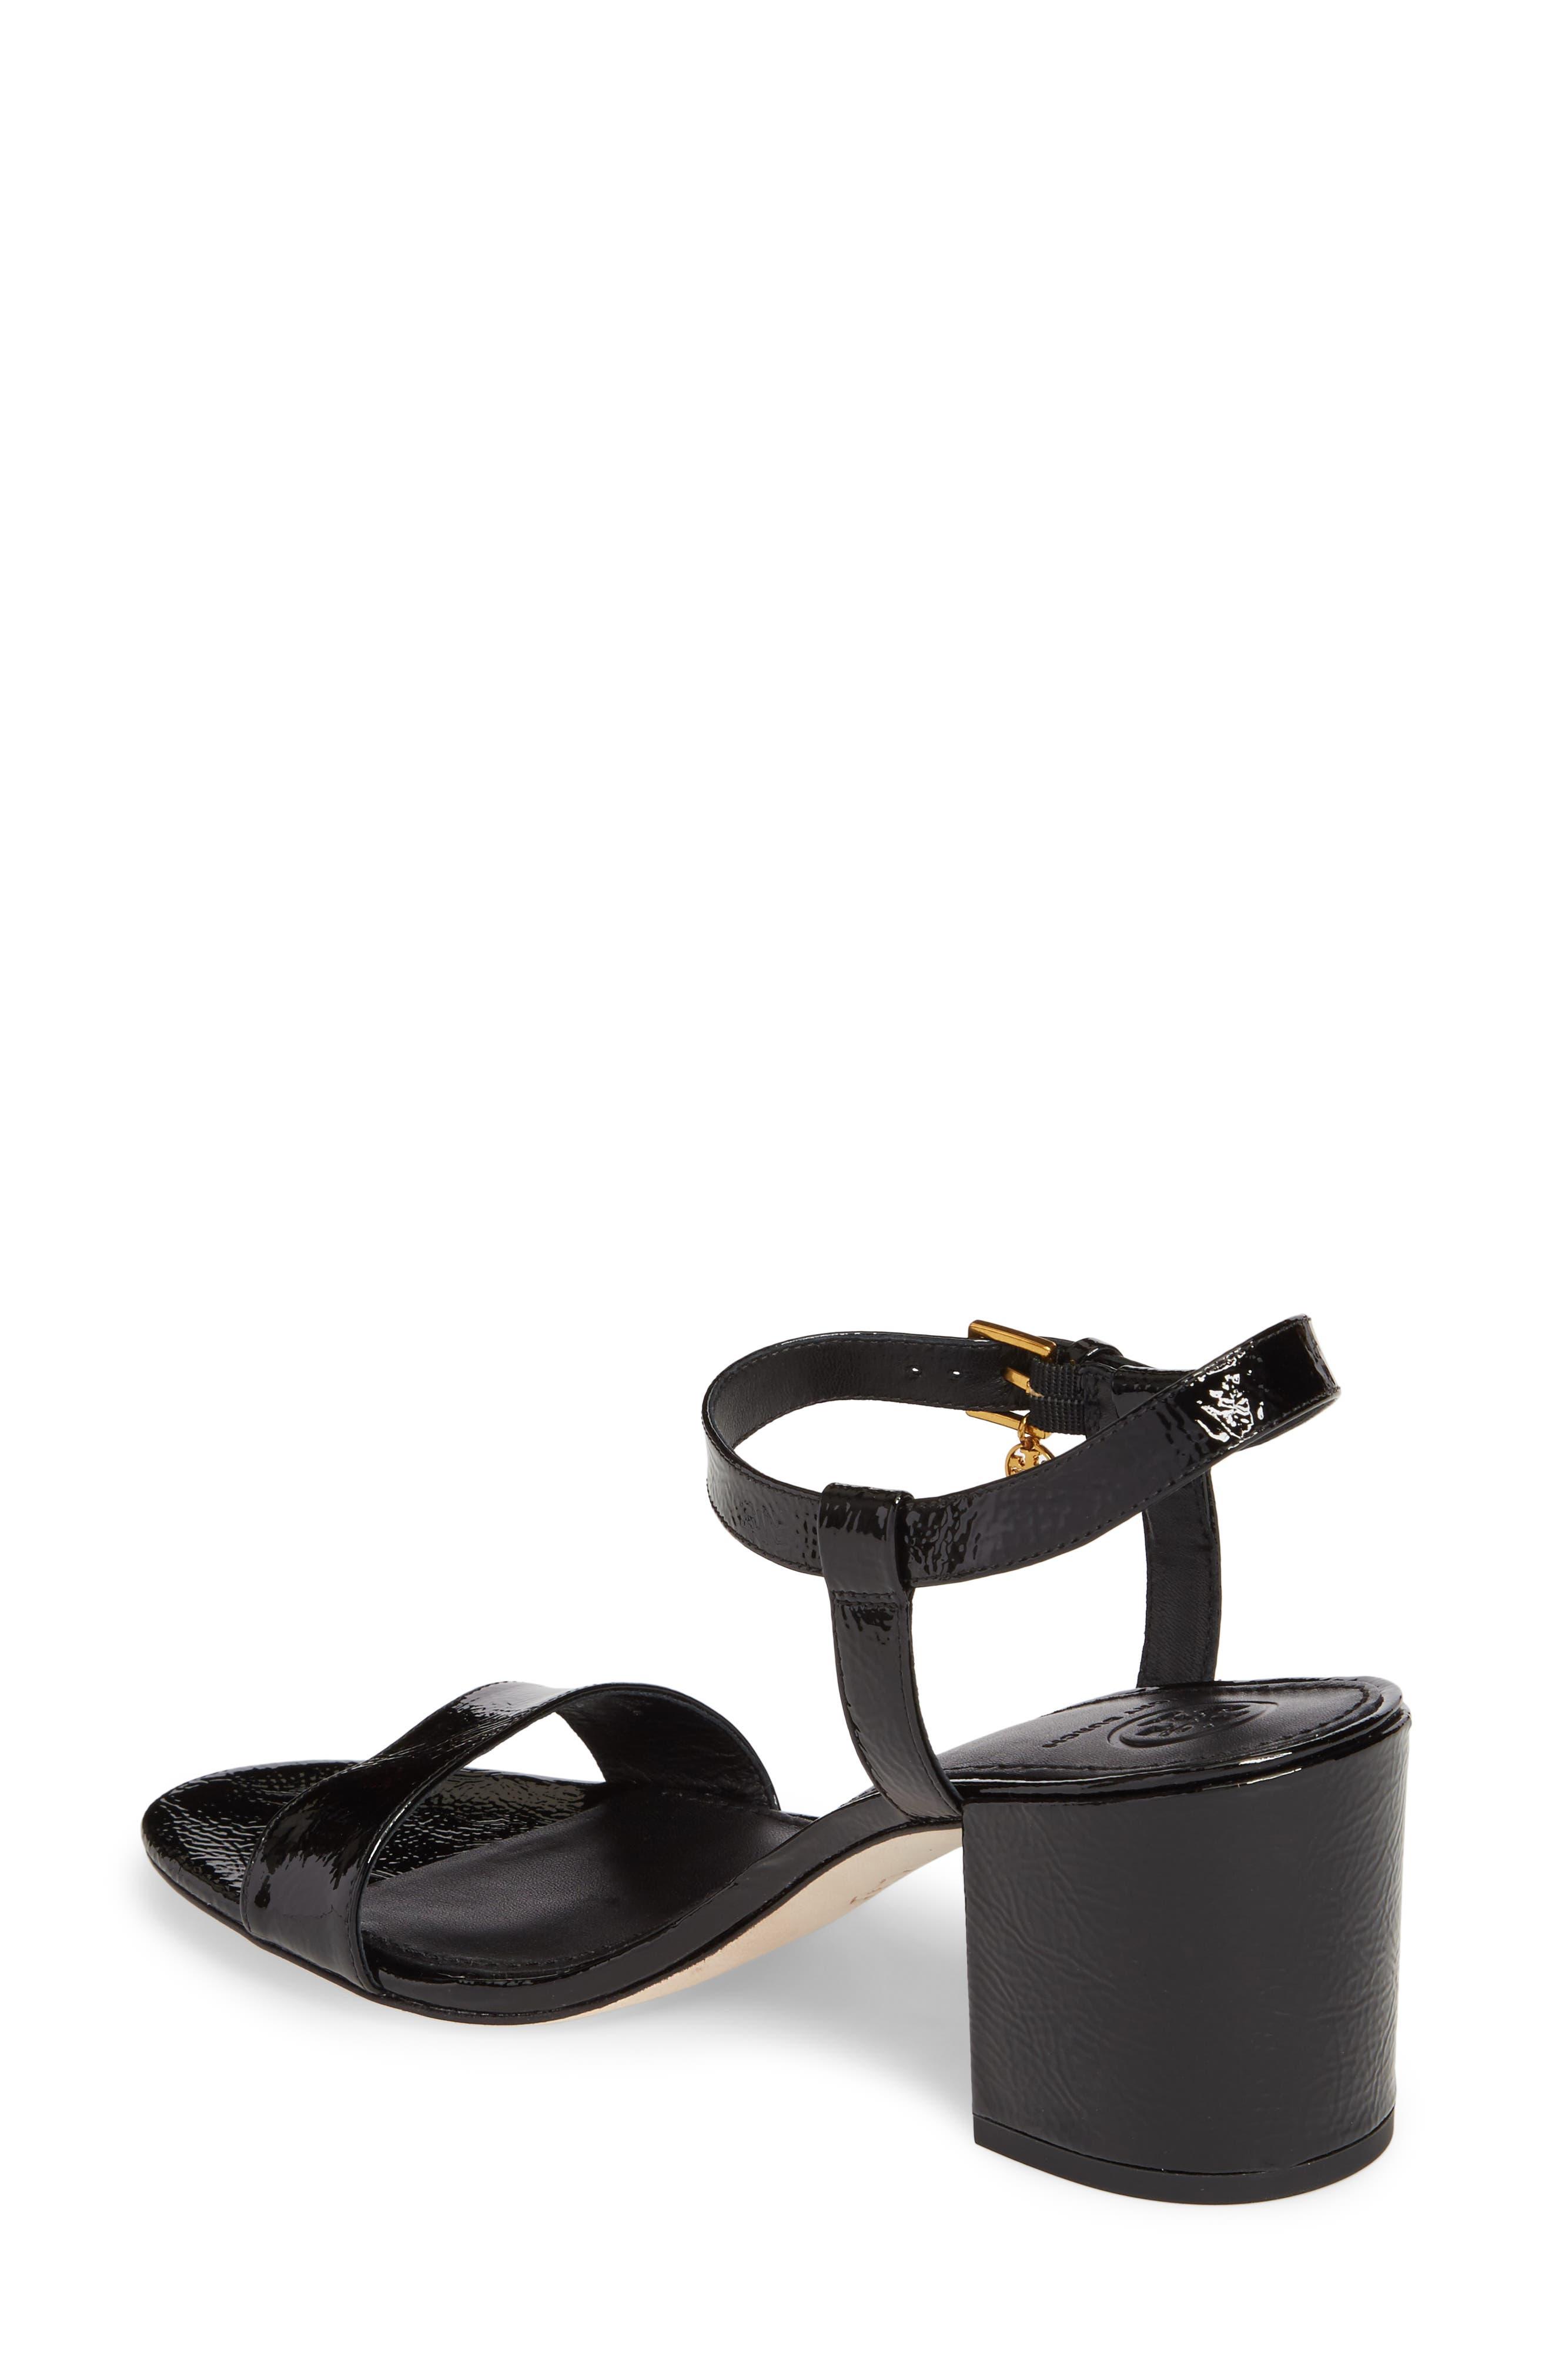 Laurel Ankle Strap Sandal,                             Alternate thumbnail 2, color,                             Black